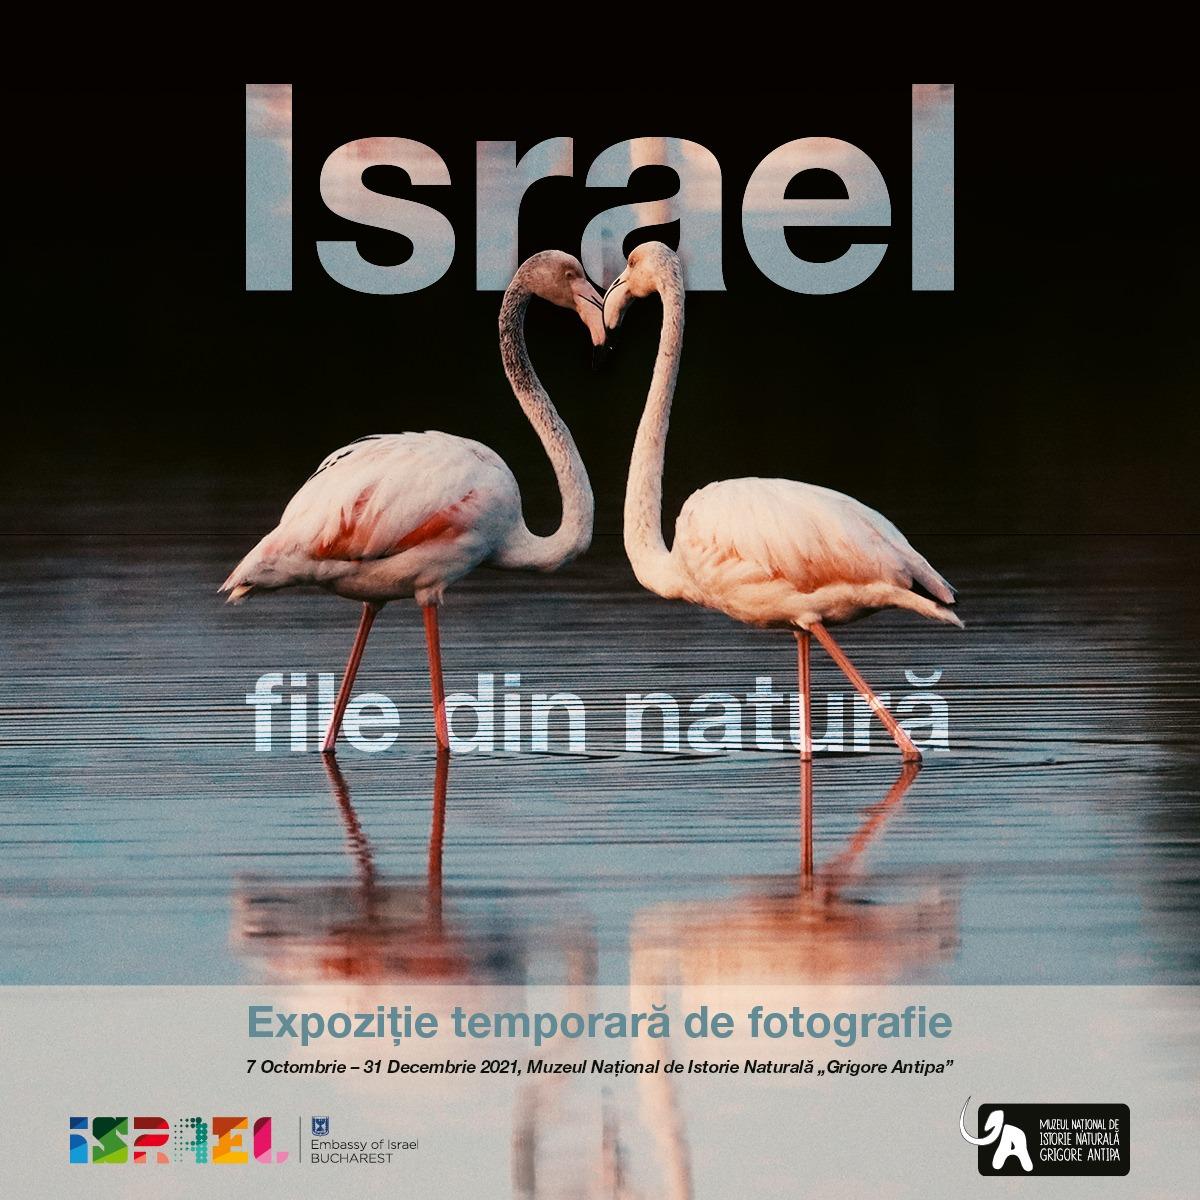 Israel-file din natura